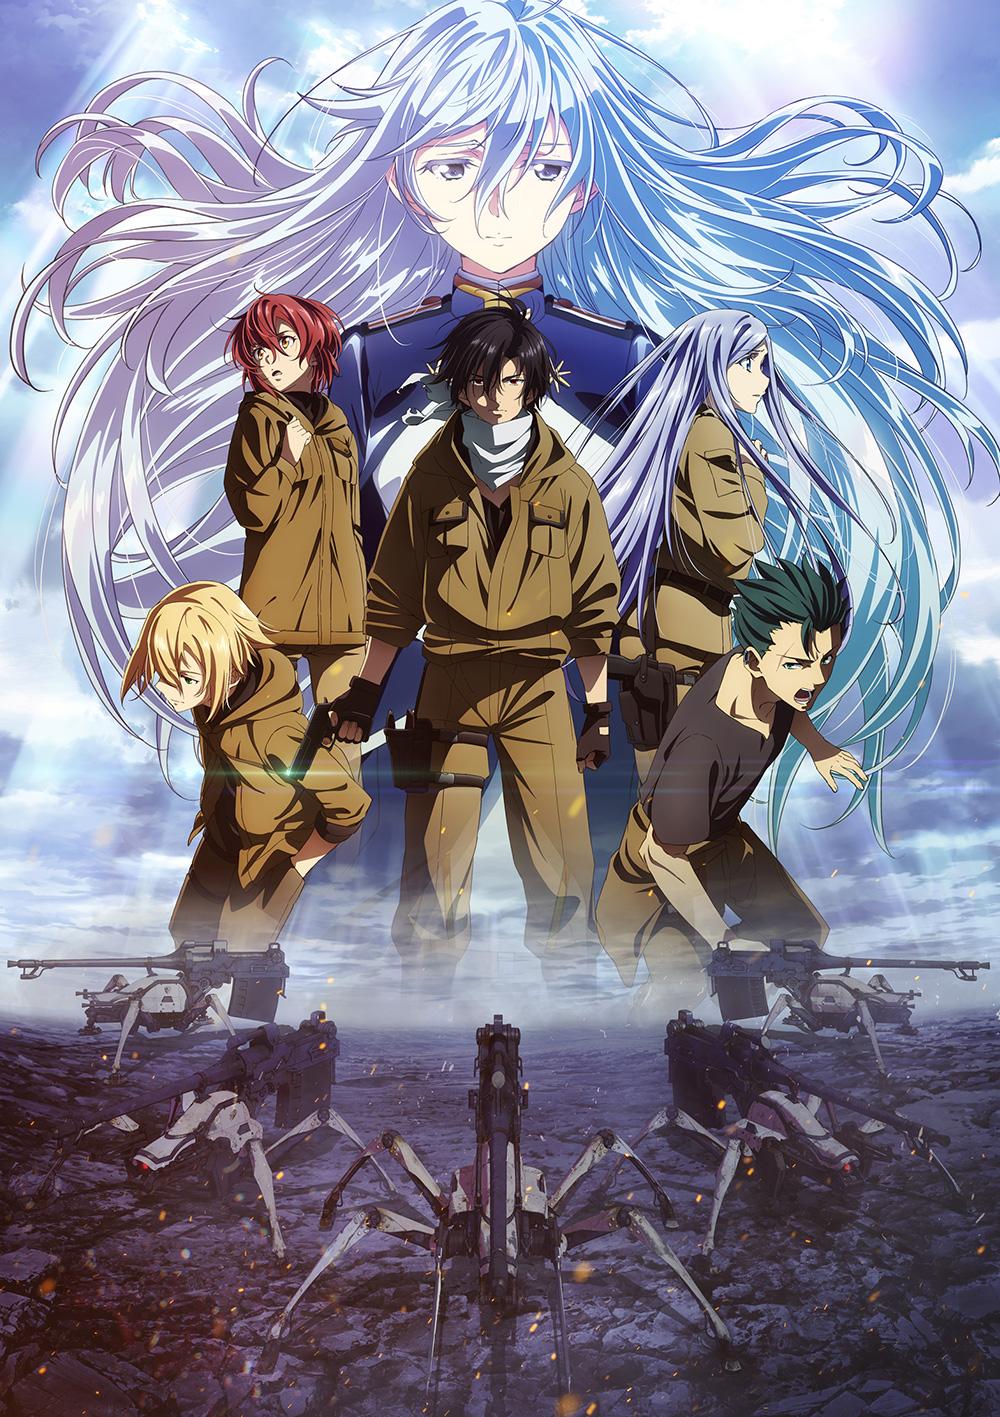 86-Anime-Visual